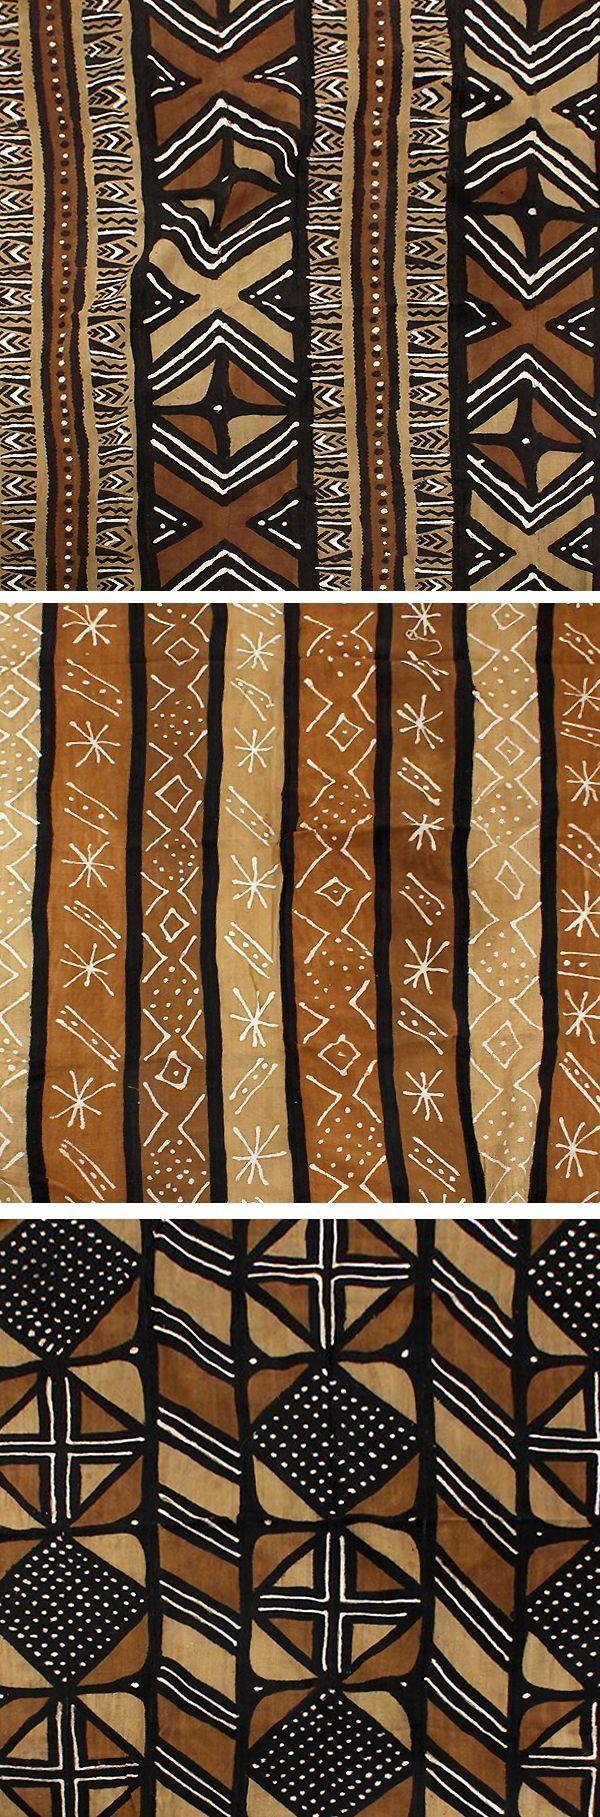 Handmade African Mudcloth Fabric - Beautiful black, brown, and tan African mudcloth fabric that is